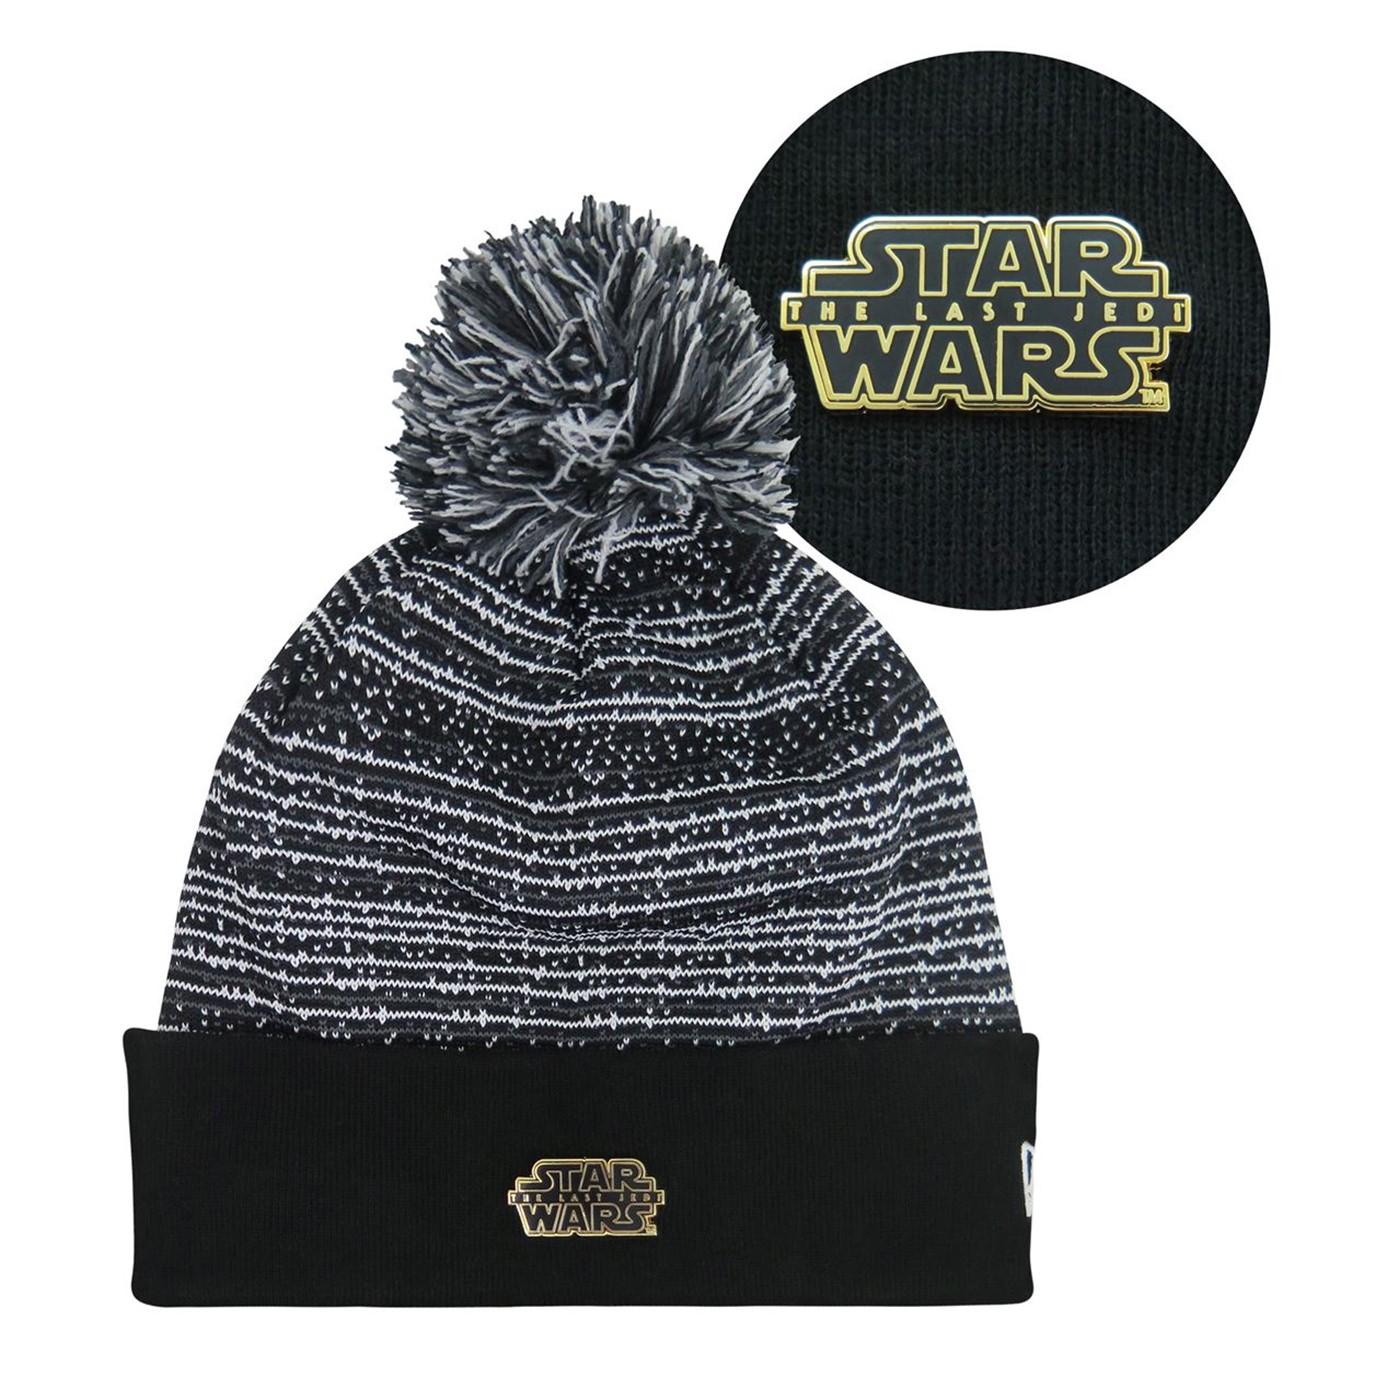 Stars Wars The Last Jedi Badge FBWY Beanie